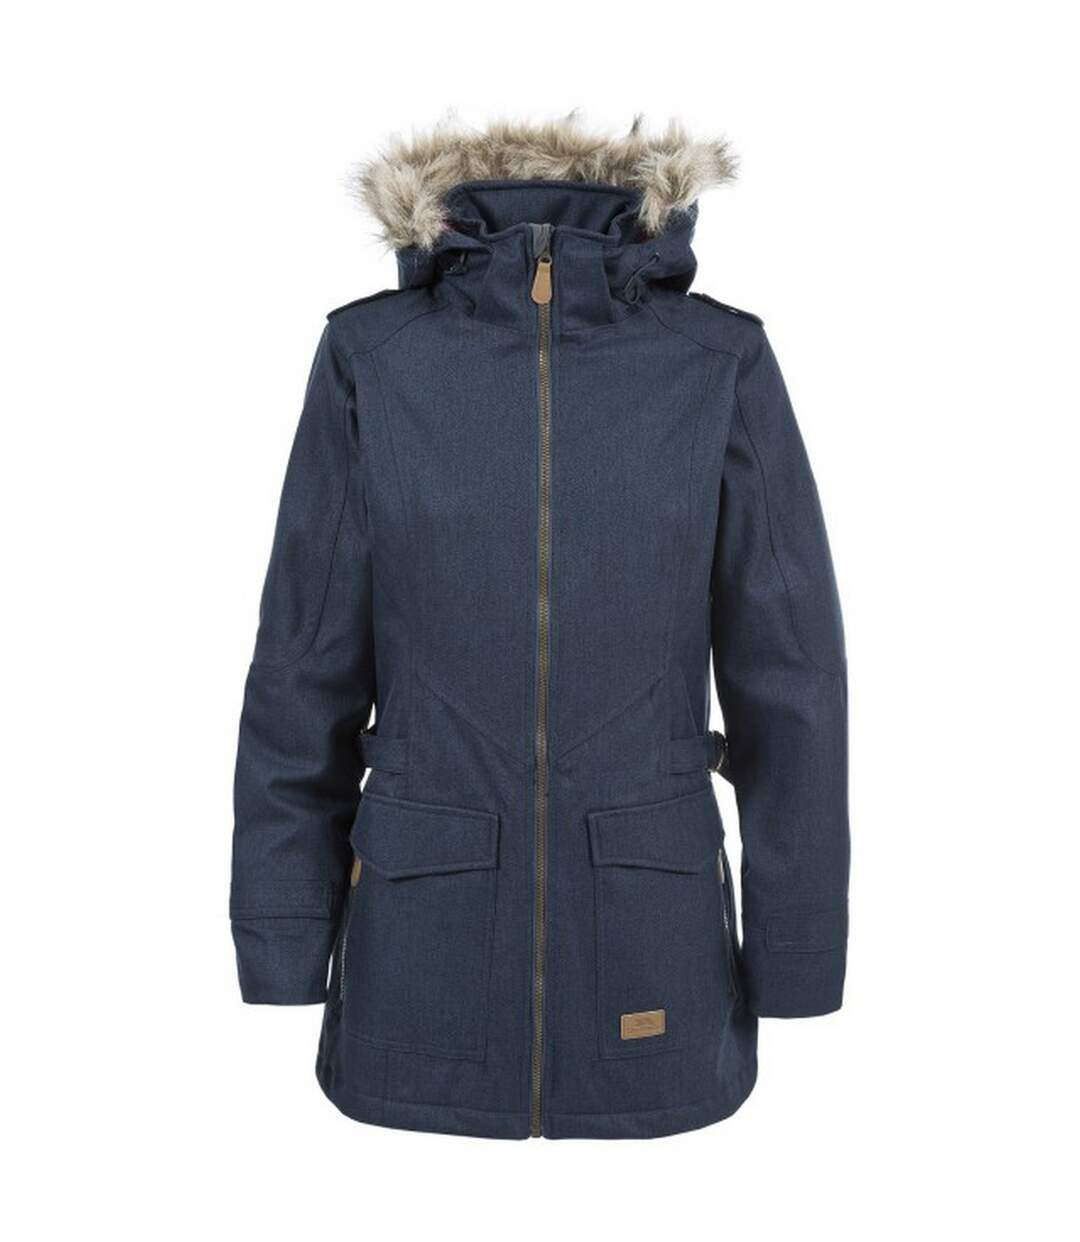 Trespass Womens/Ladies Everyday Waterproof Jacket (Navy) - UTTP4437